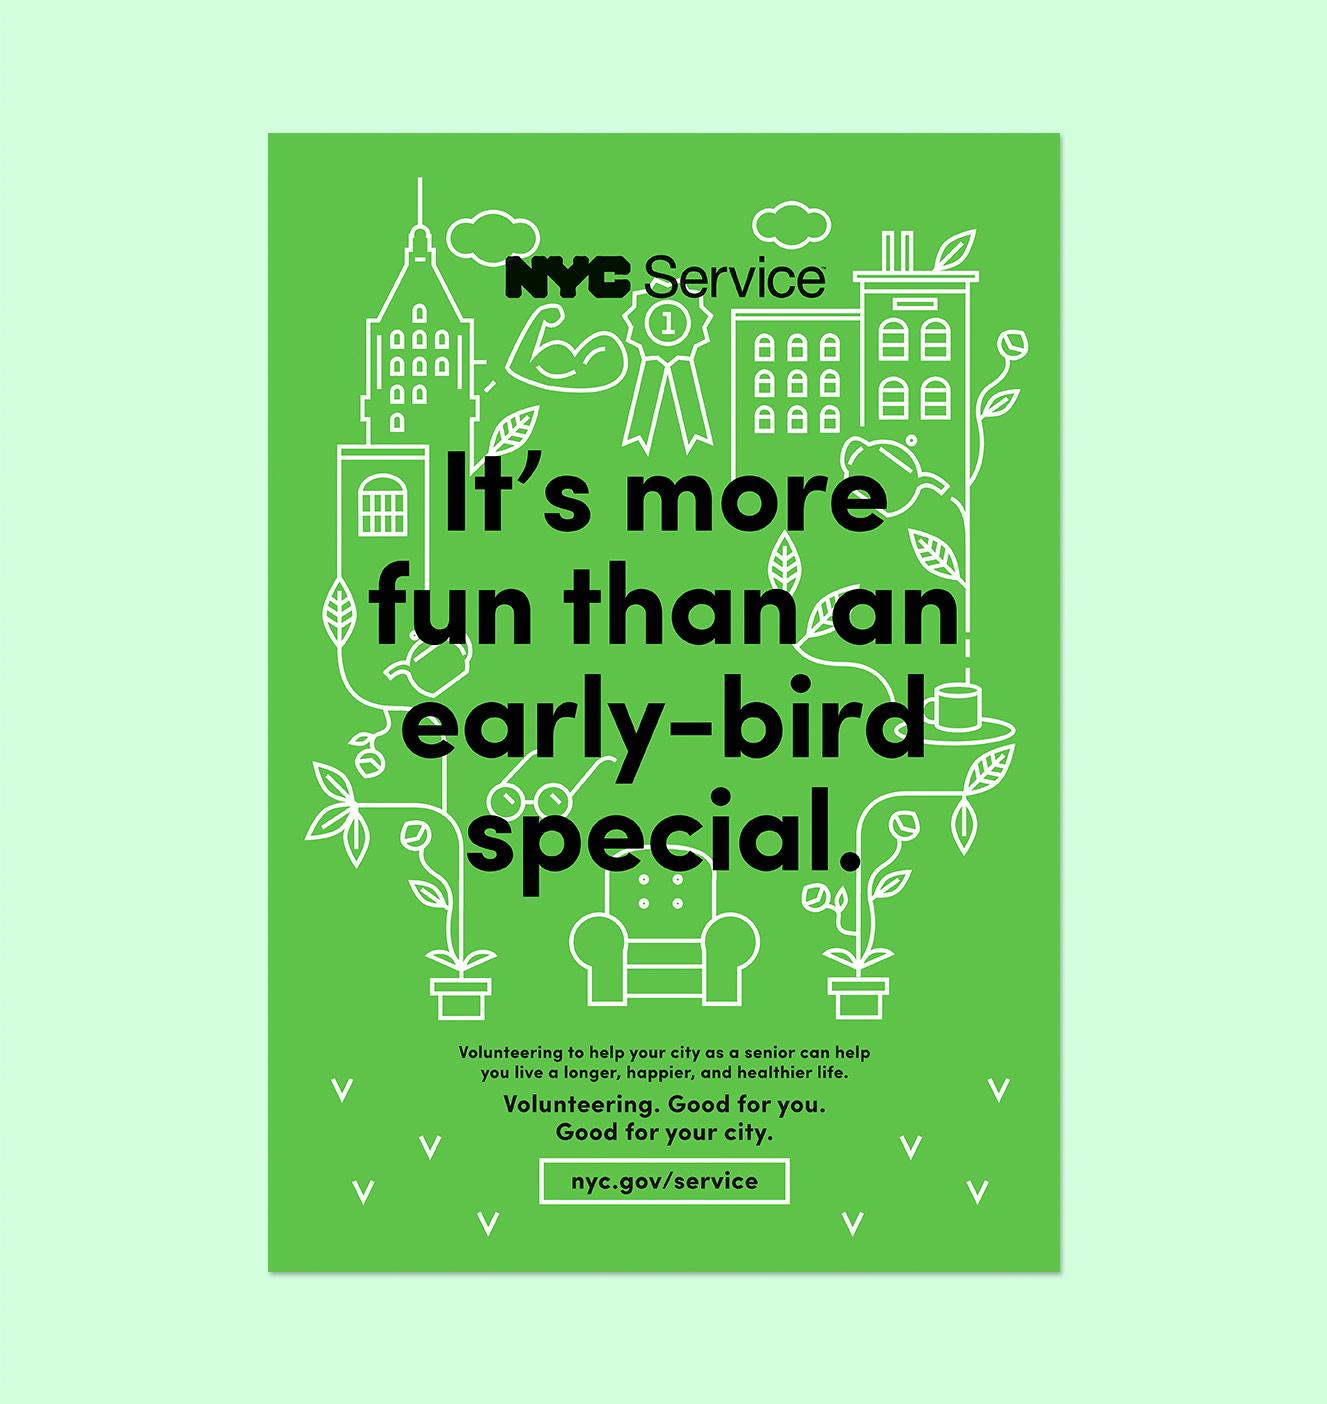 NYC_Service_2018_2